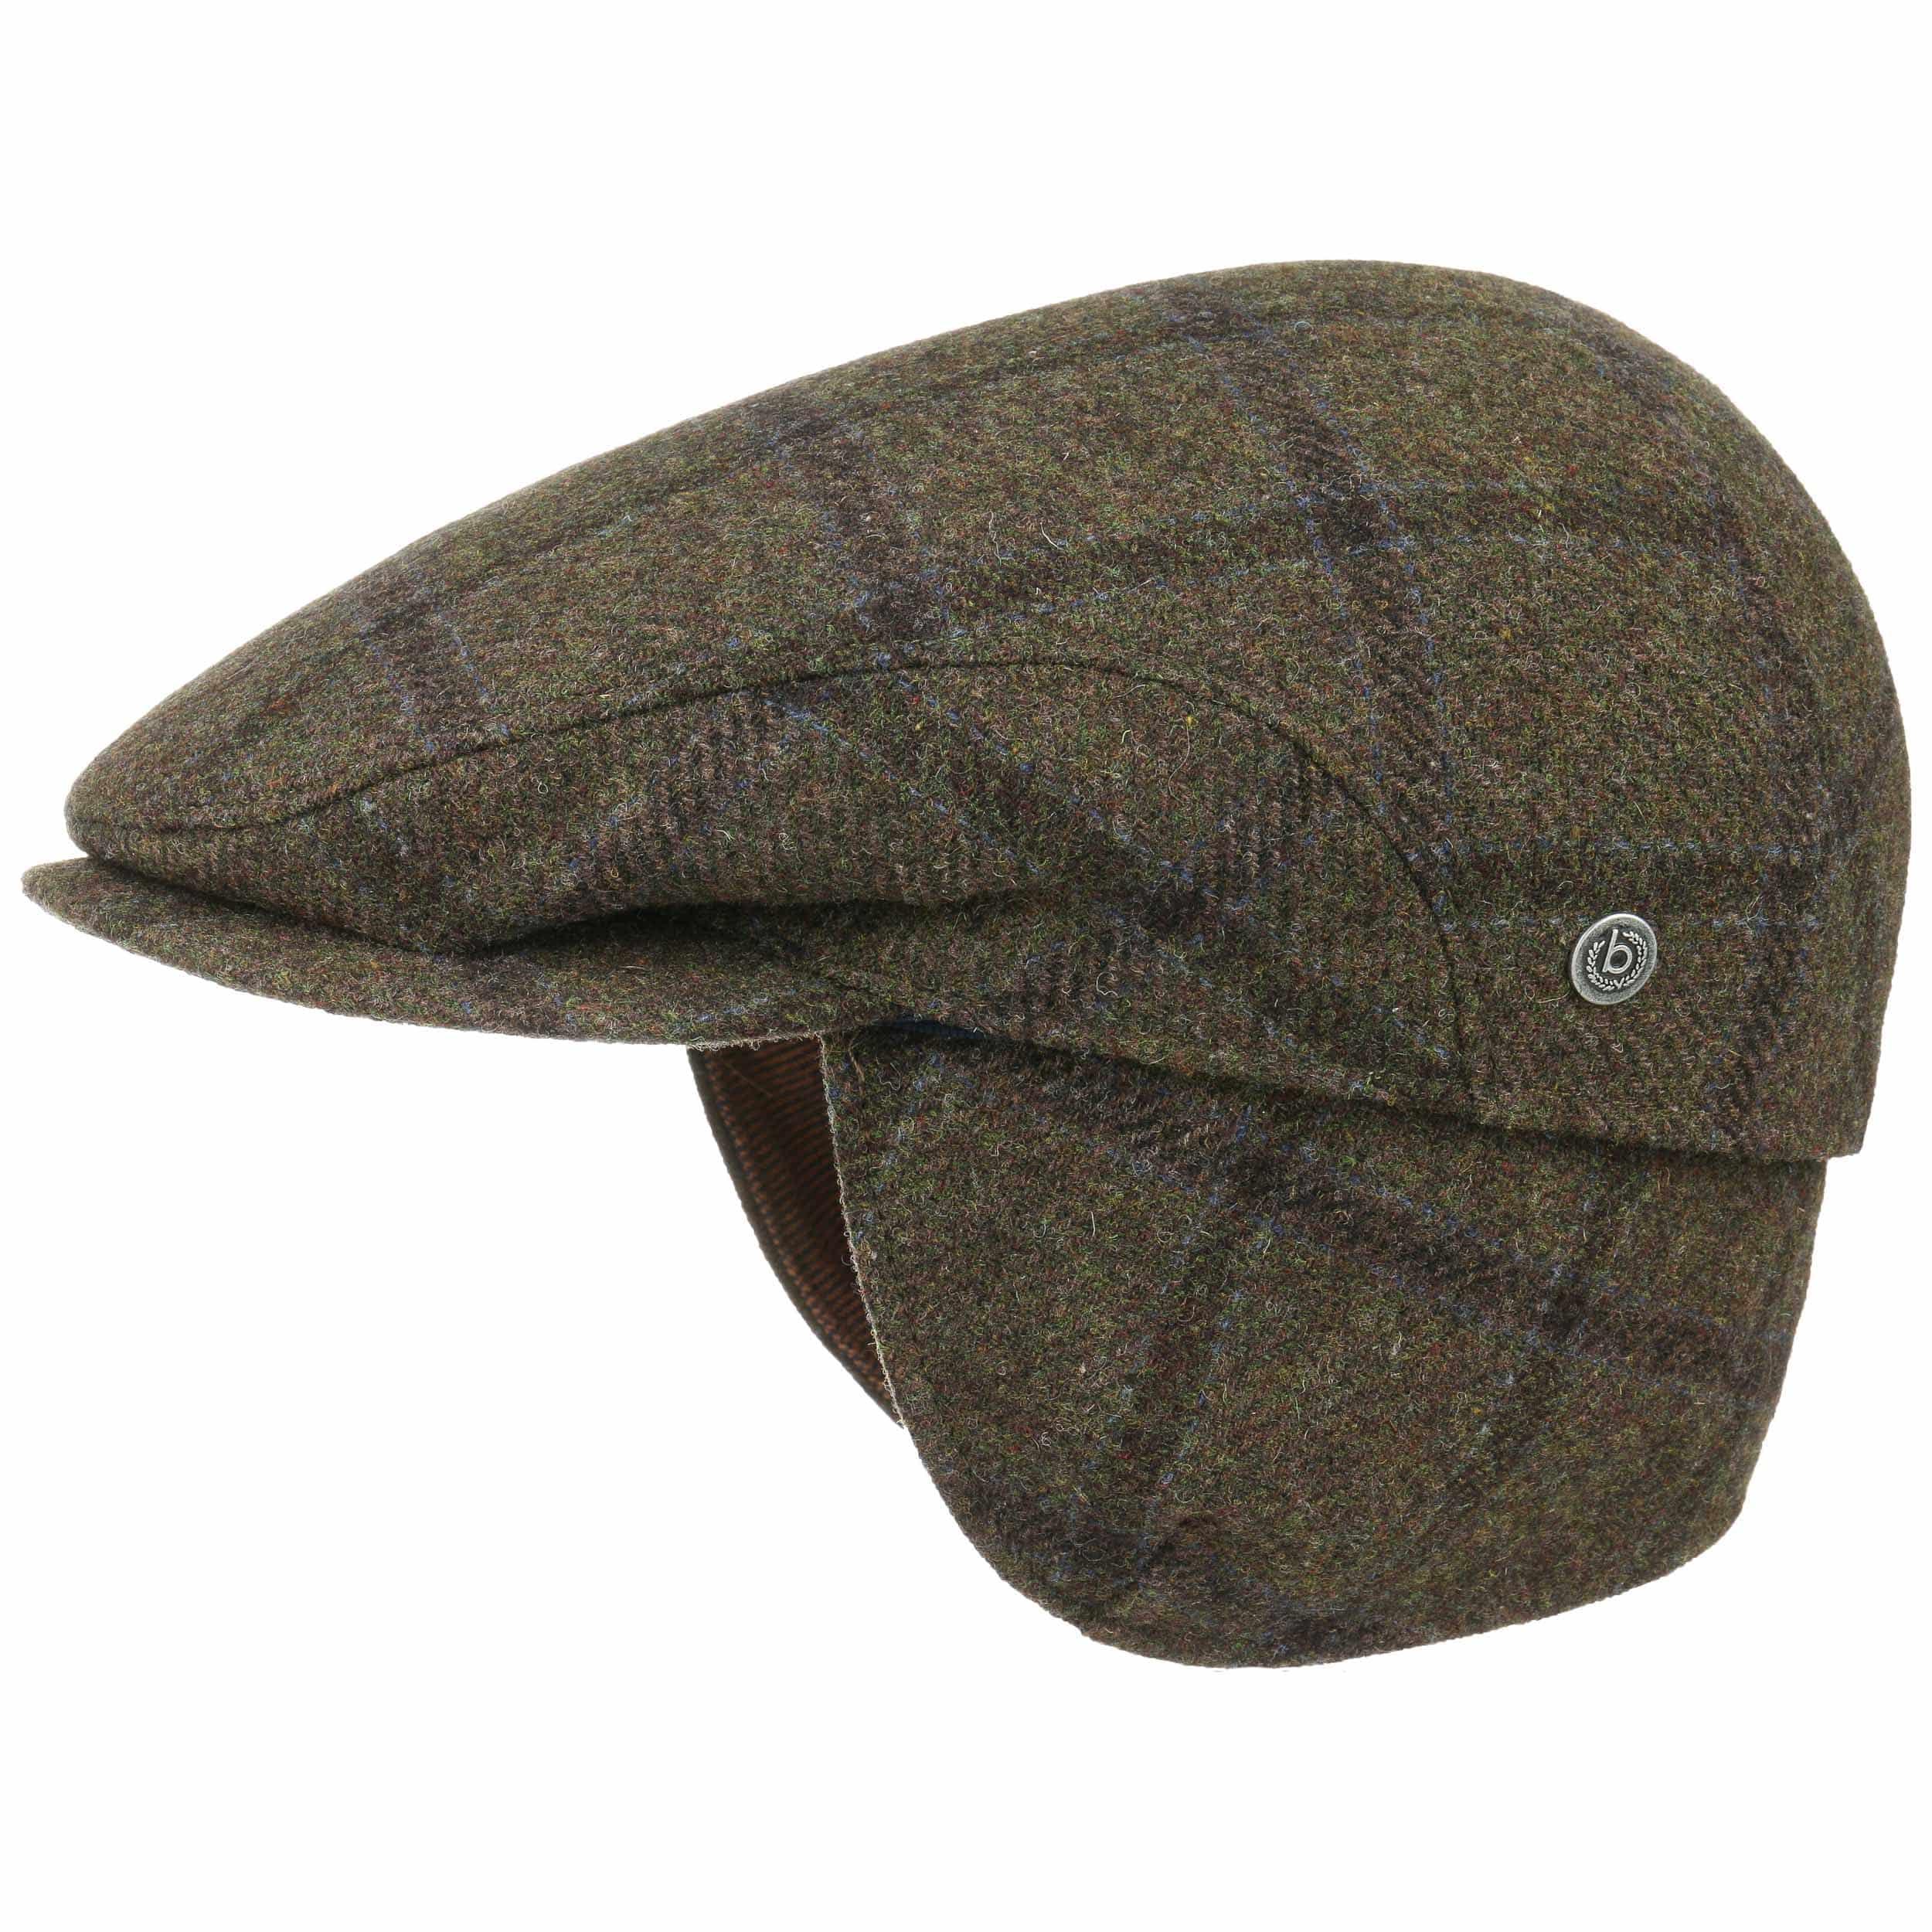 a45eb8b92 Check Flat Cap with Earflaps by bugatti